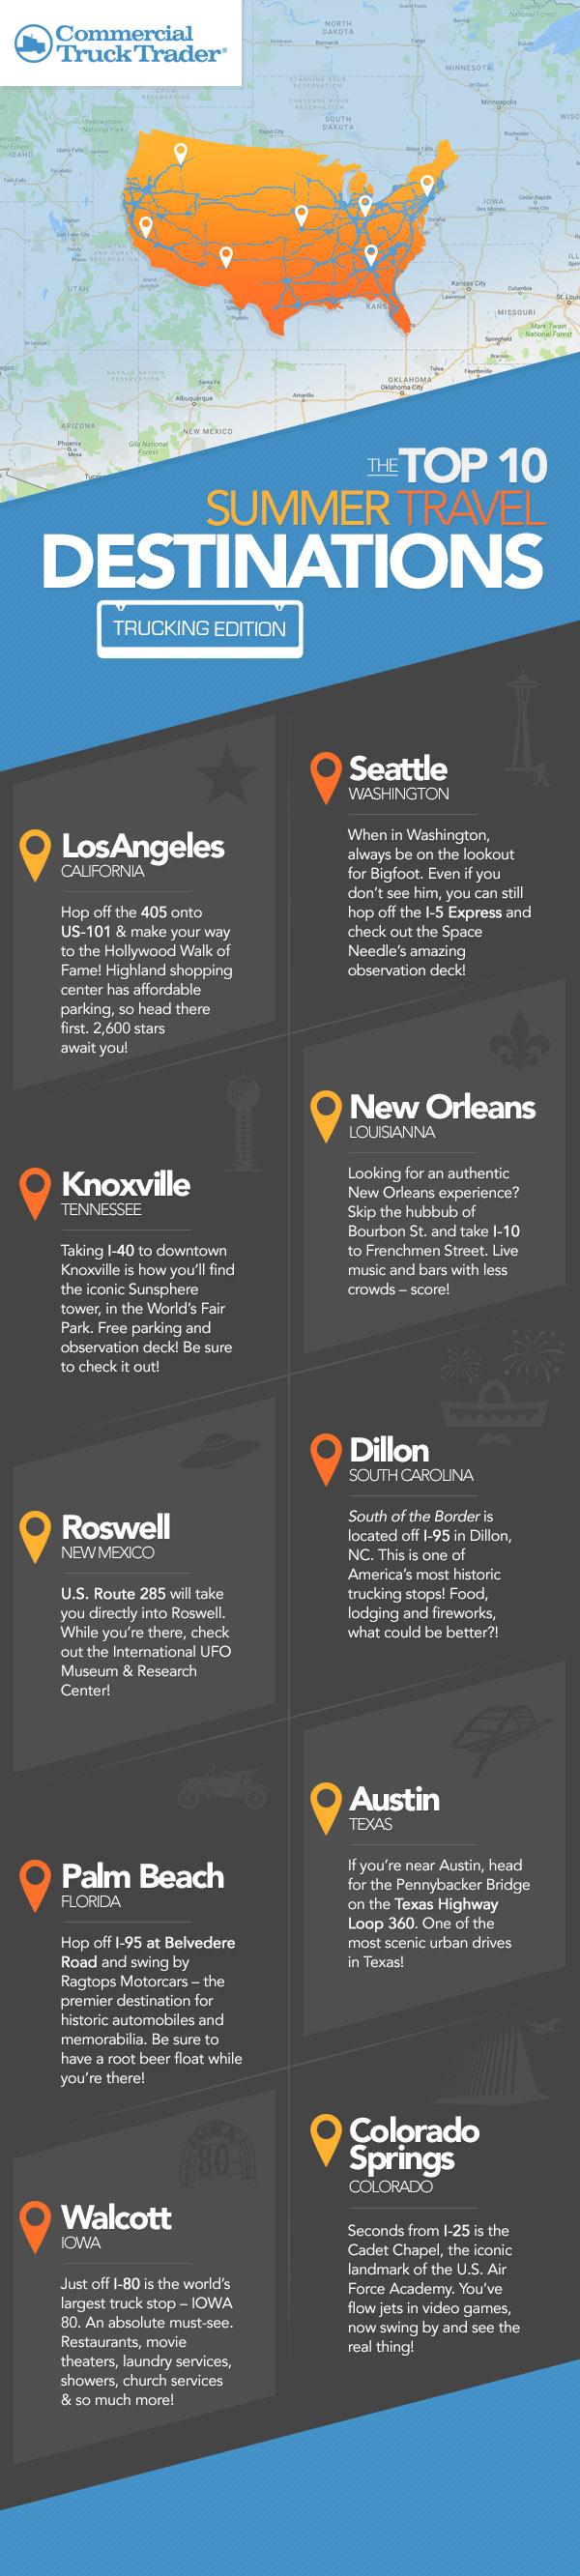 ctt-summer-destinations-infographic-v3.jpg